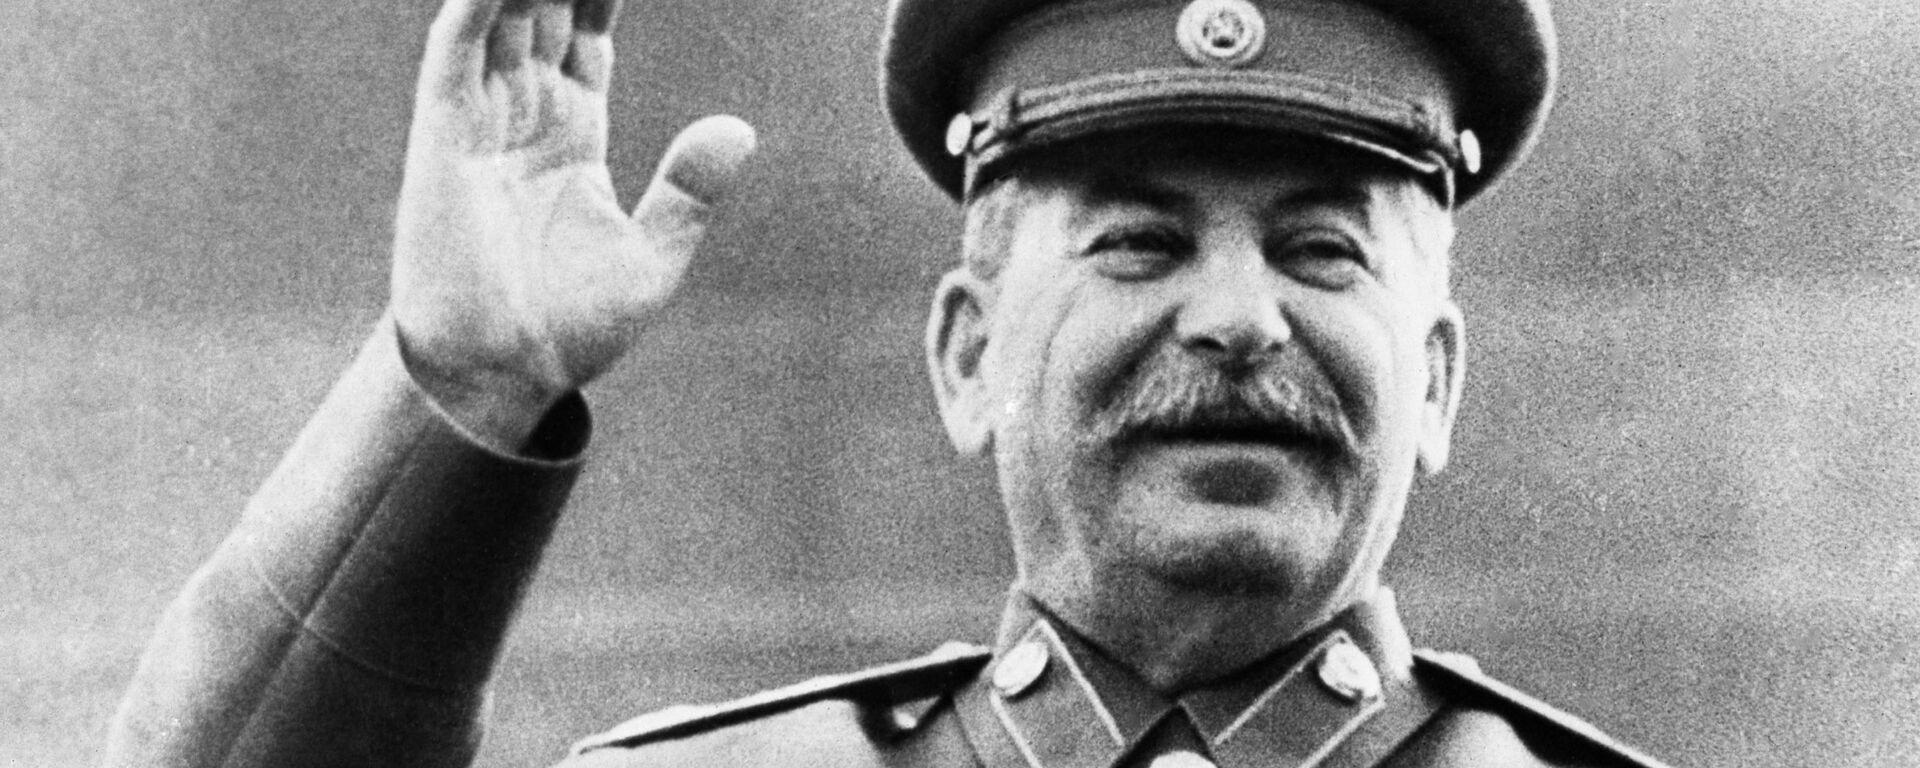 Józef Stalin  - Sputnik Polska, 1920, 30.08.2021